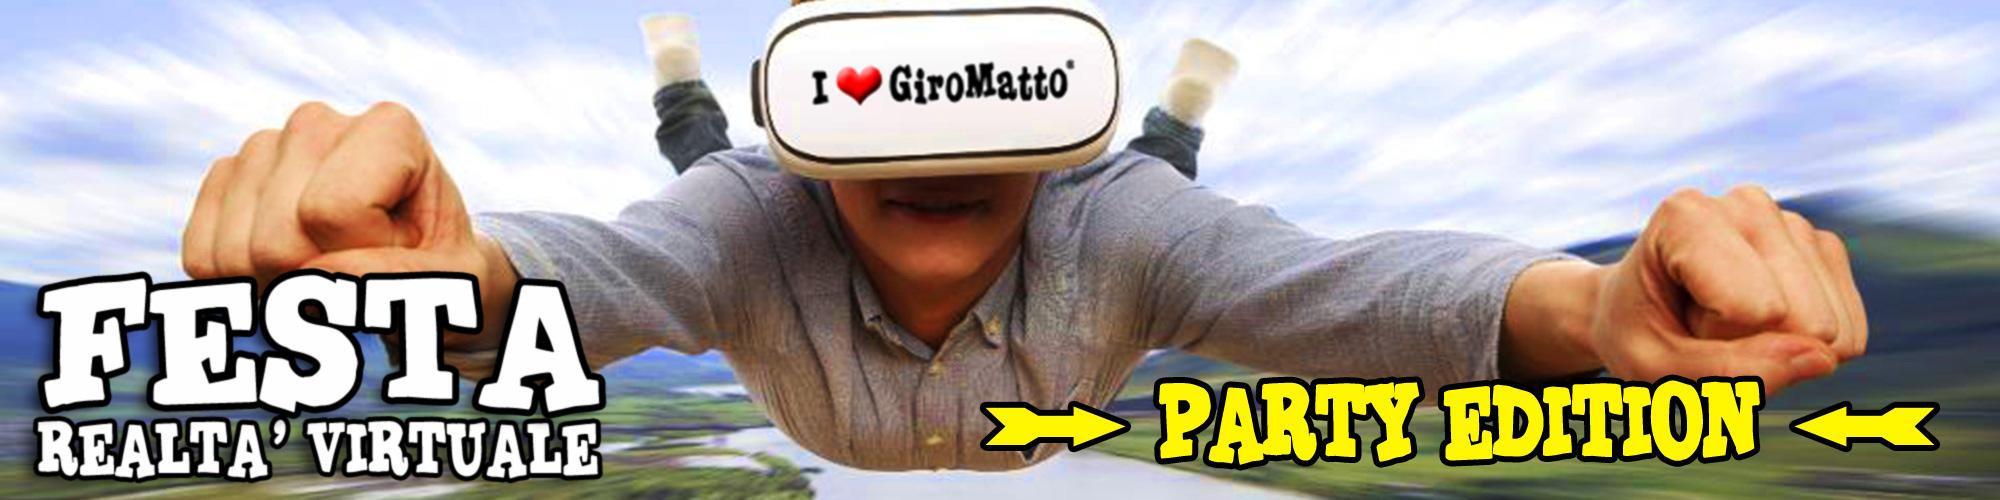 festa realtà virtuale party edition